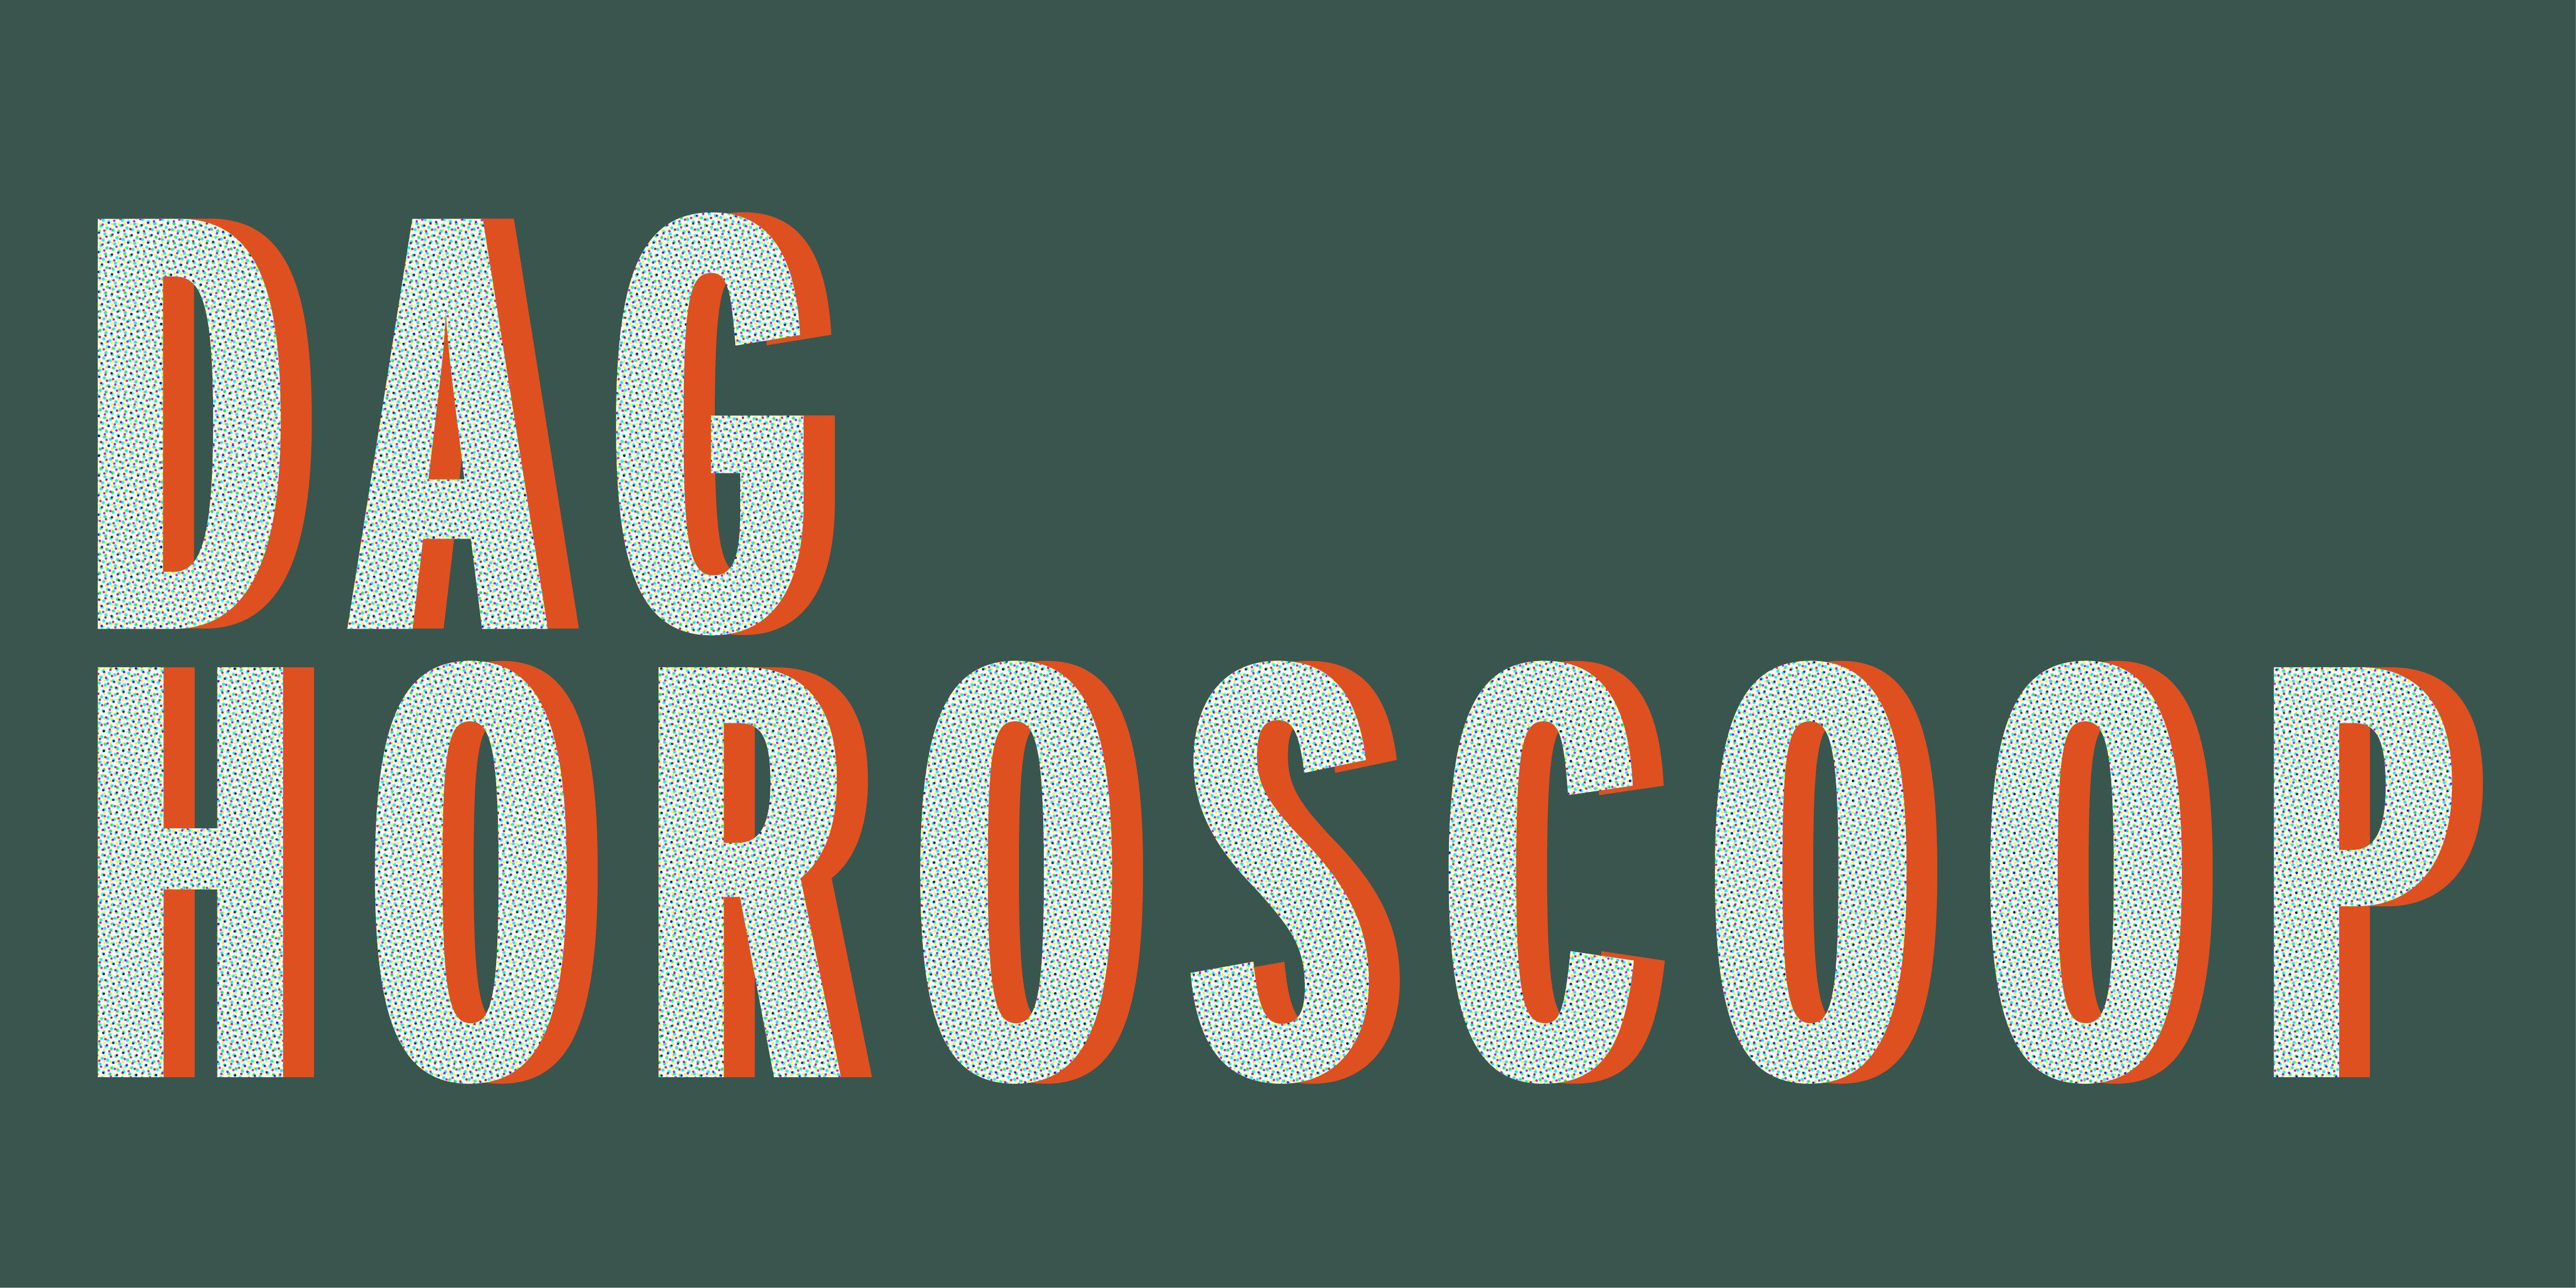 Daghoroscoop, ELLE horoscoop